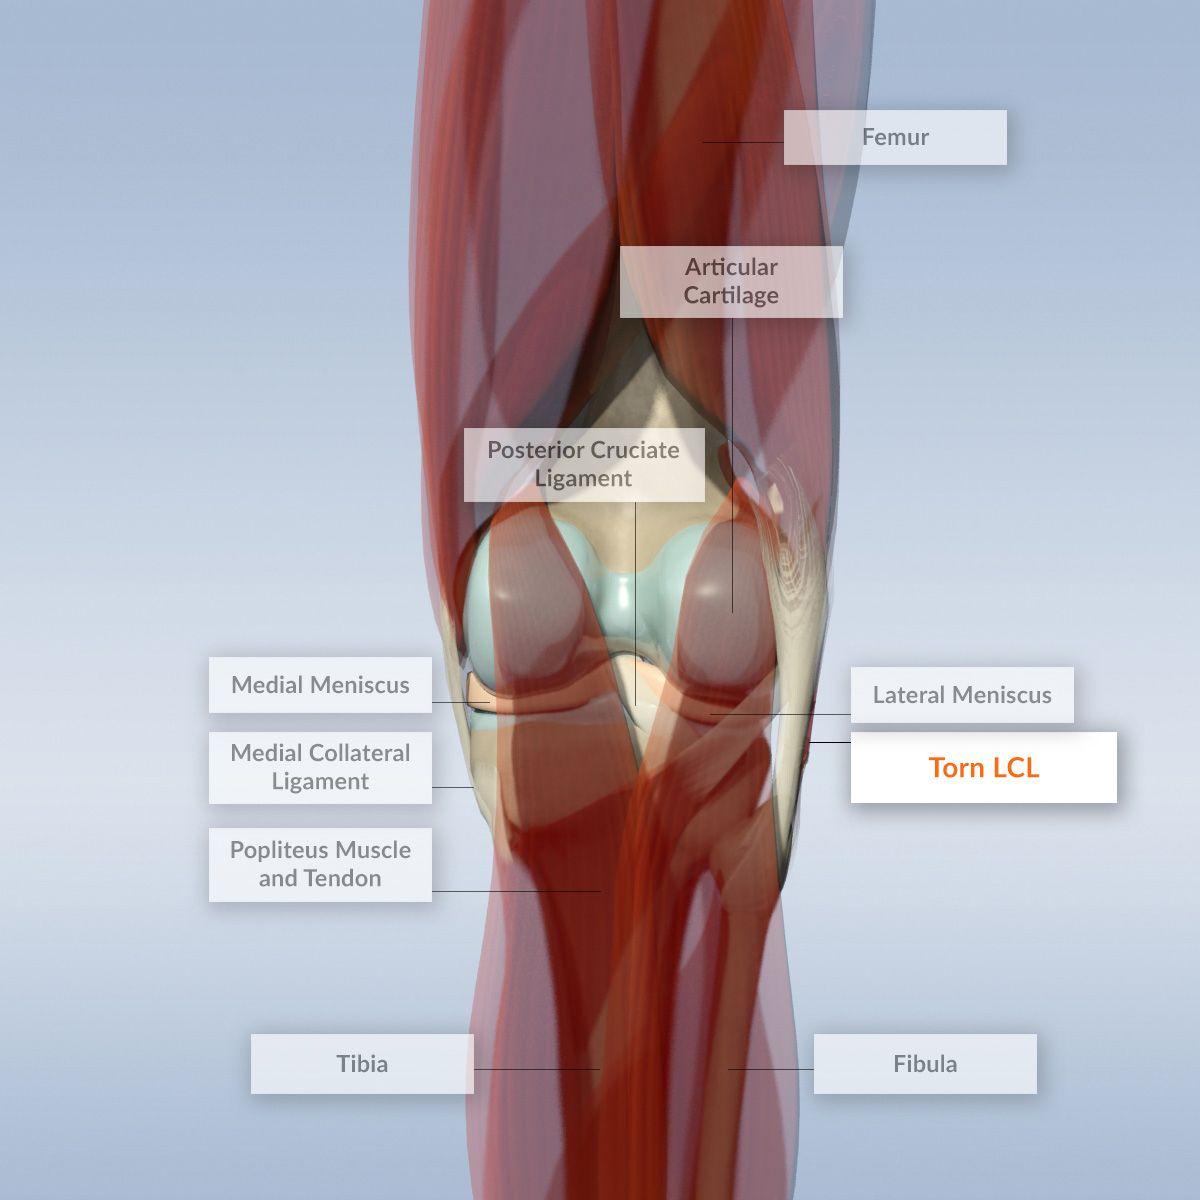 Human Knee Anatomy Human Anatomy Drawing Human Anatomy Drawing